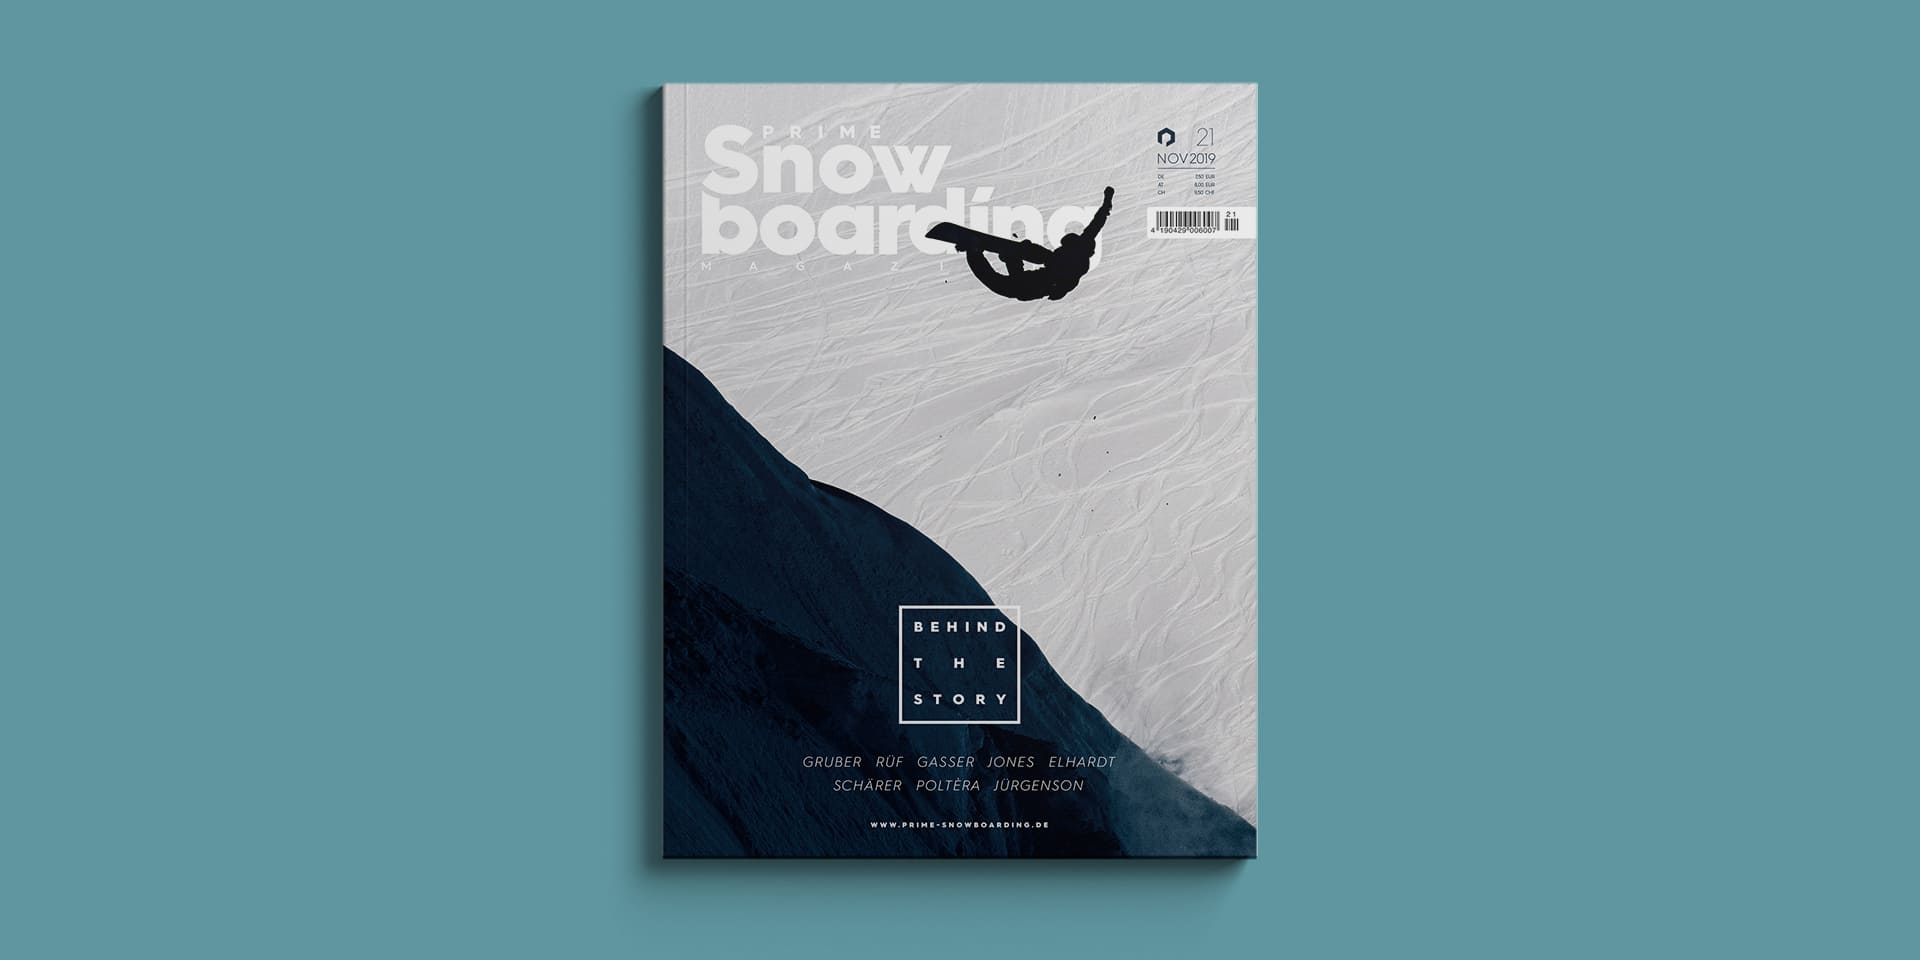 Prime Snowboarding Ausgabe #21